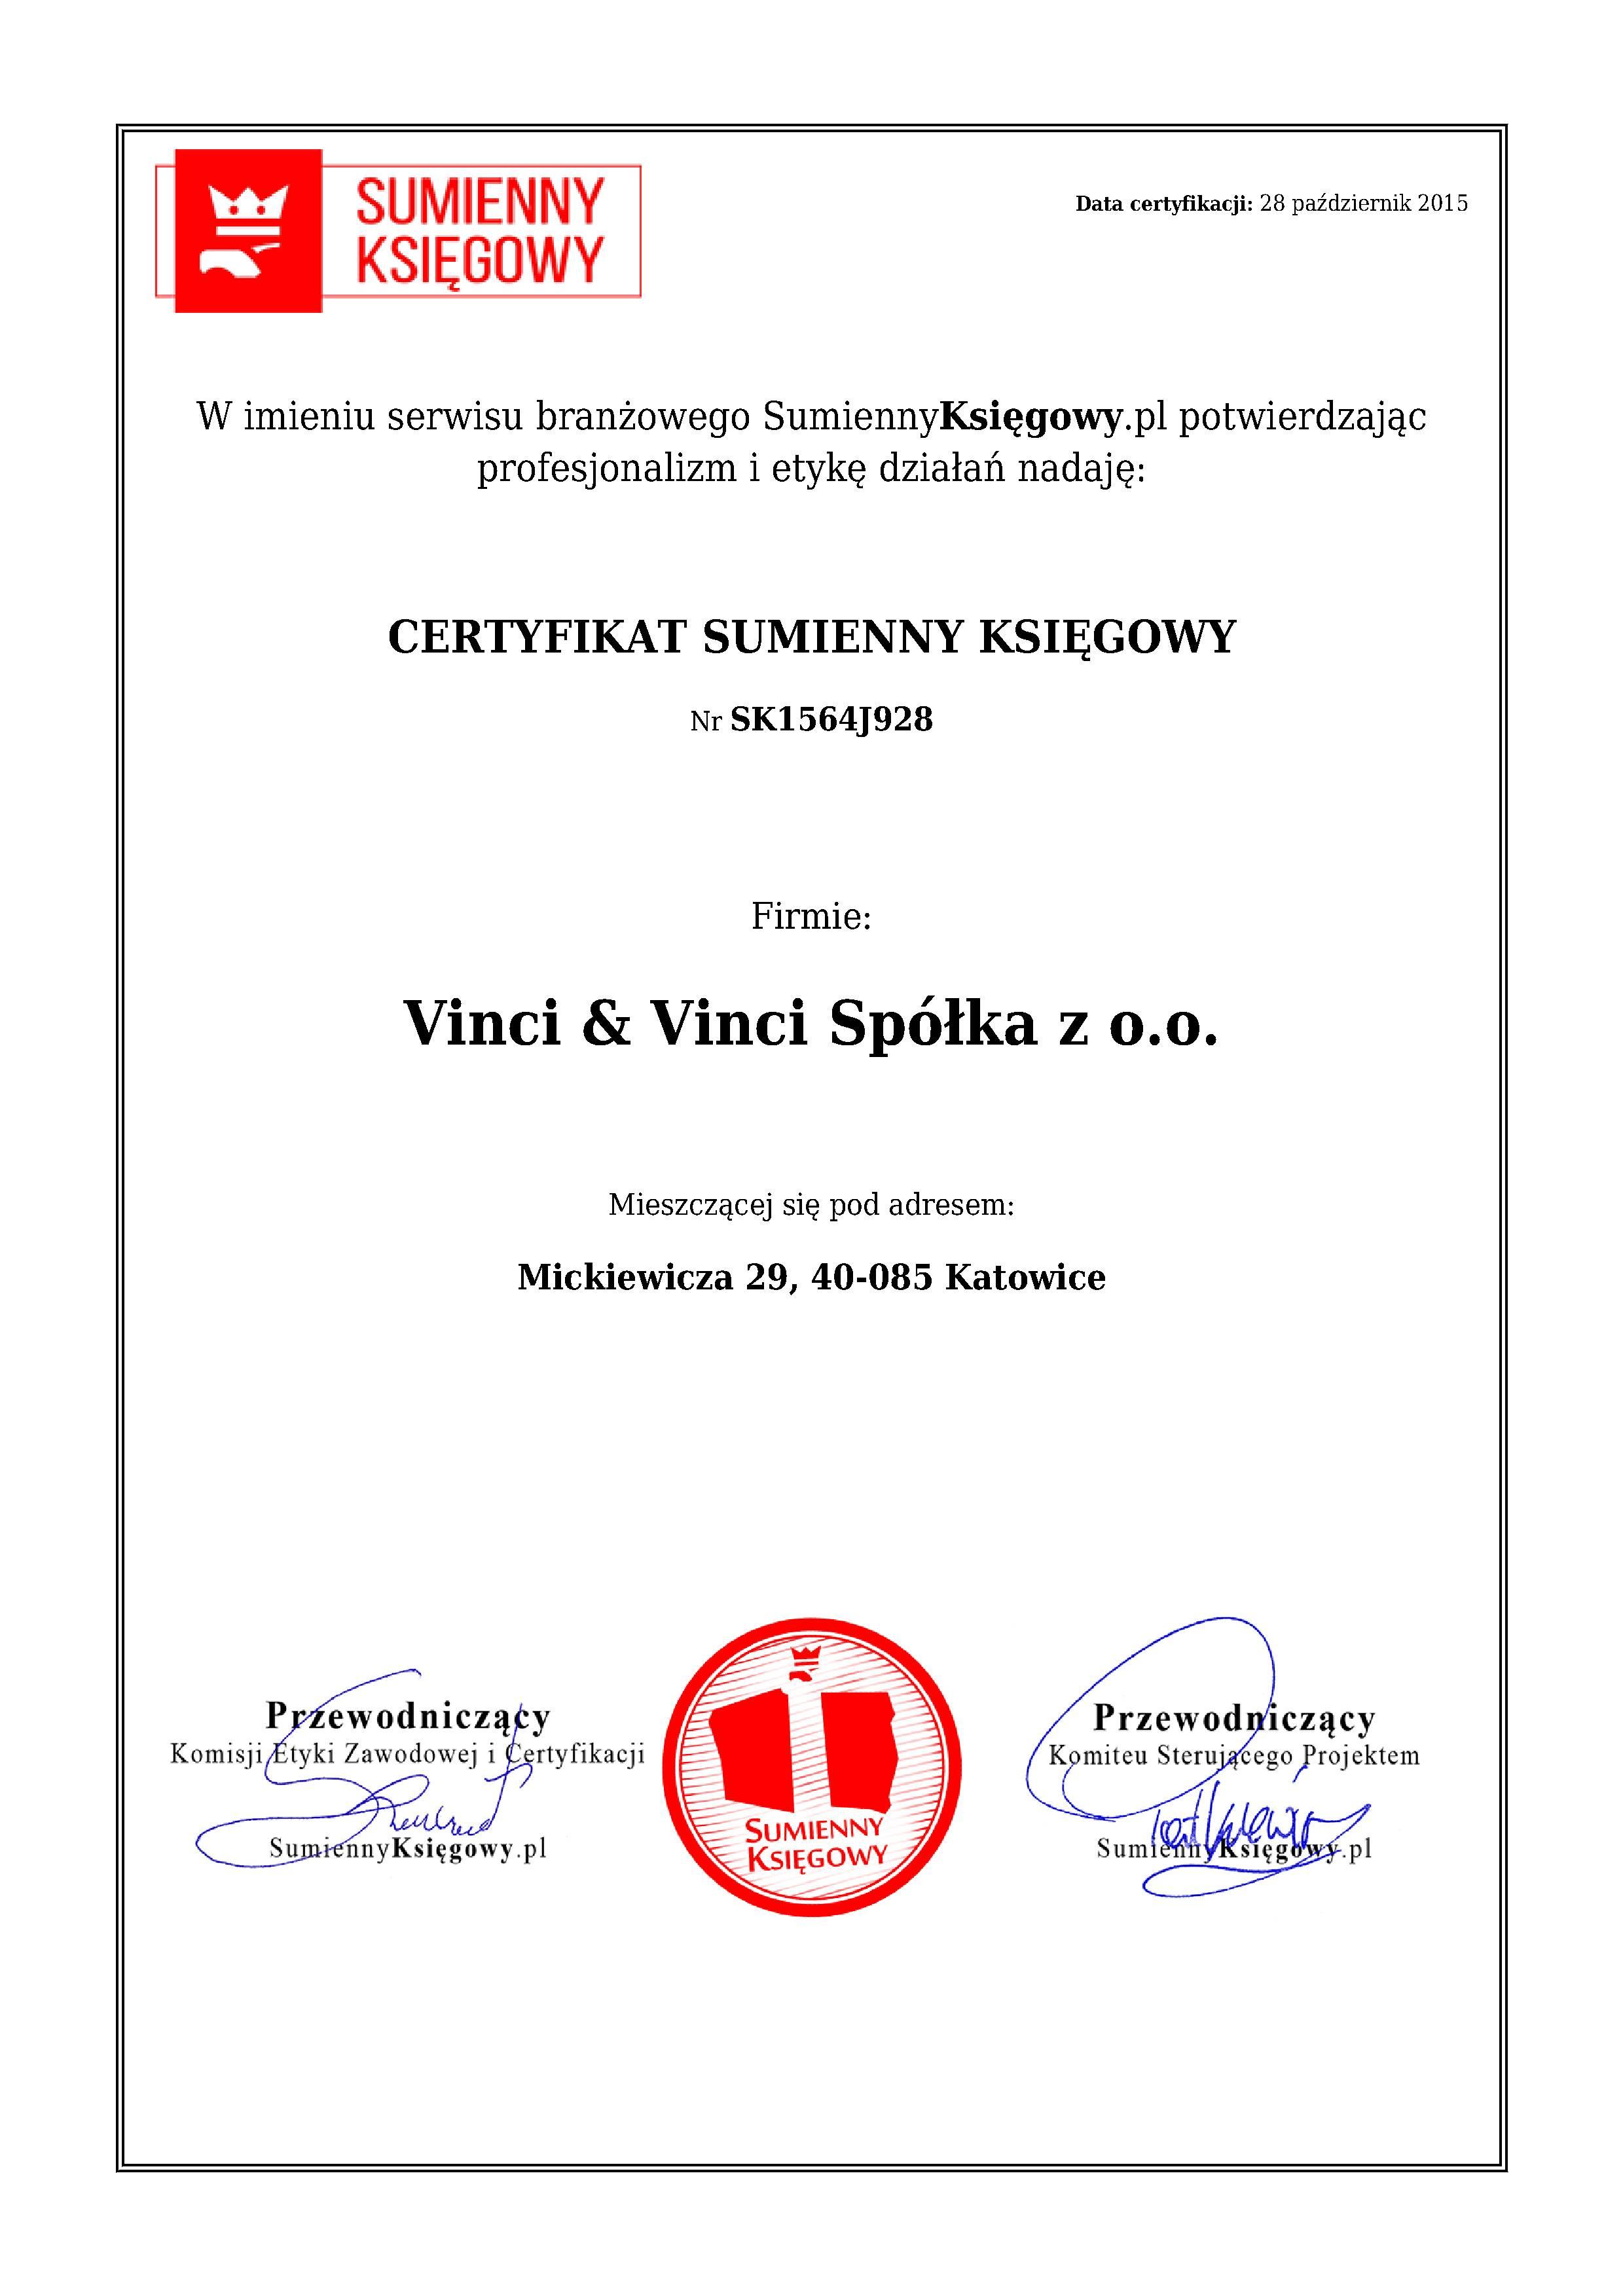 Certyfikat Vinci & Vinci Spółka z o.o.